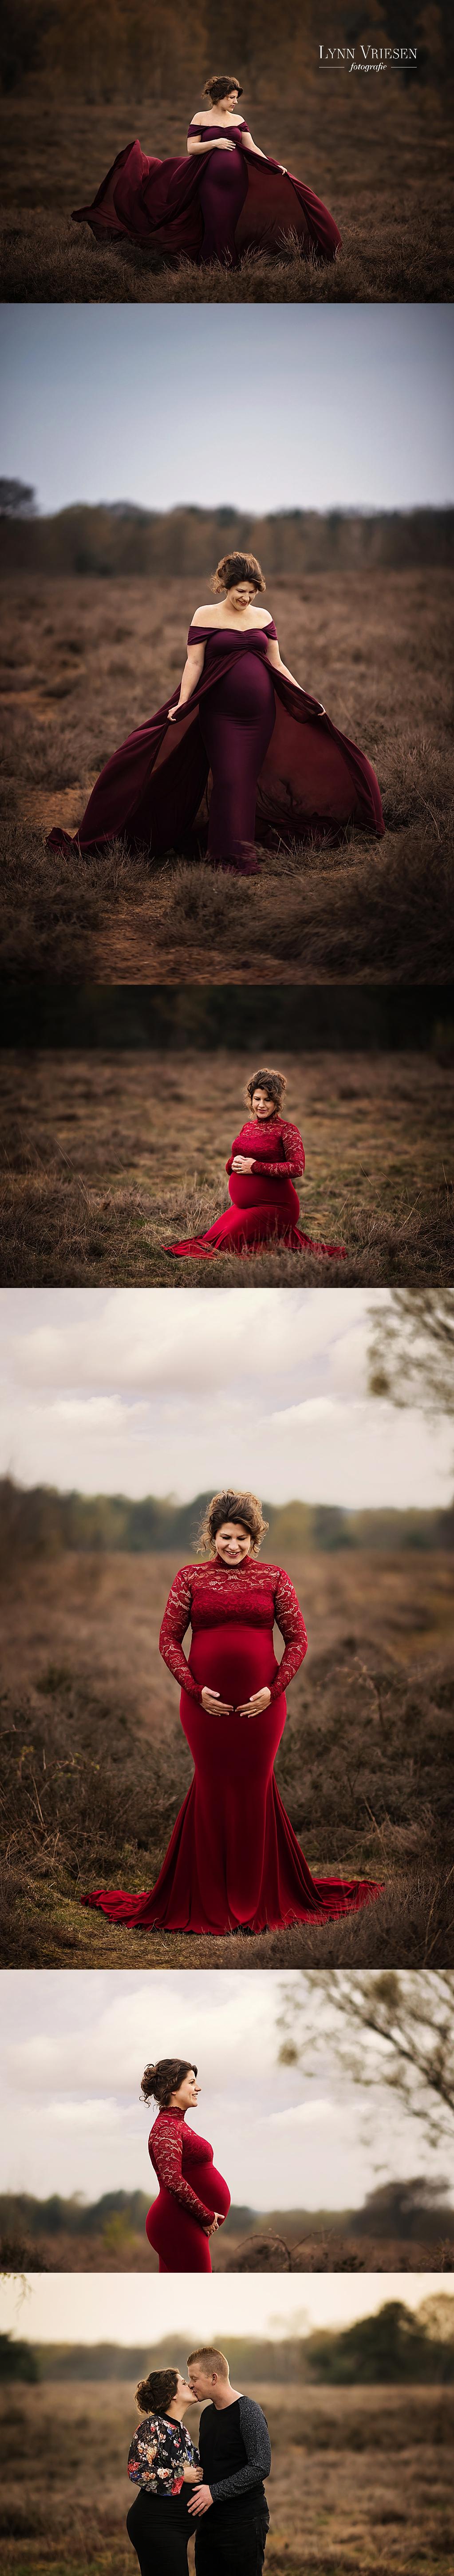 Janita 34 weken - zwanger fotoshoot Dodewaard